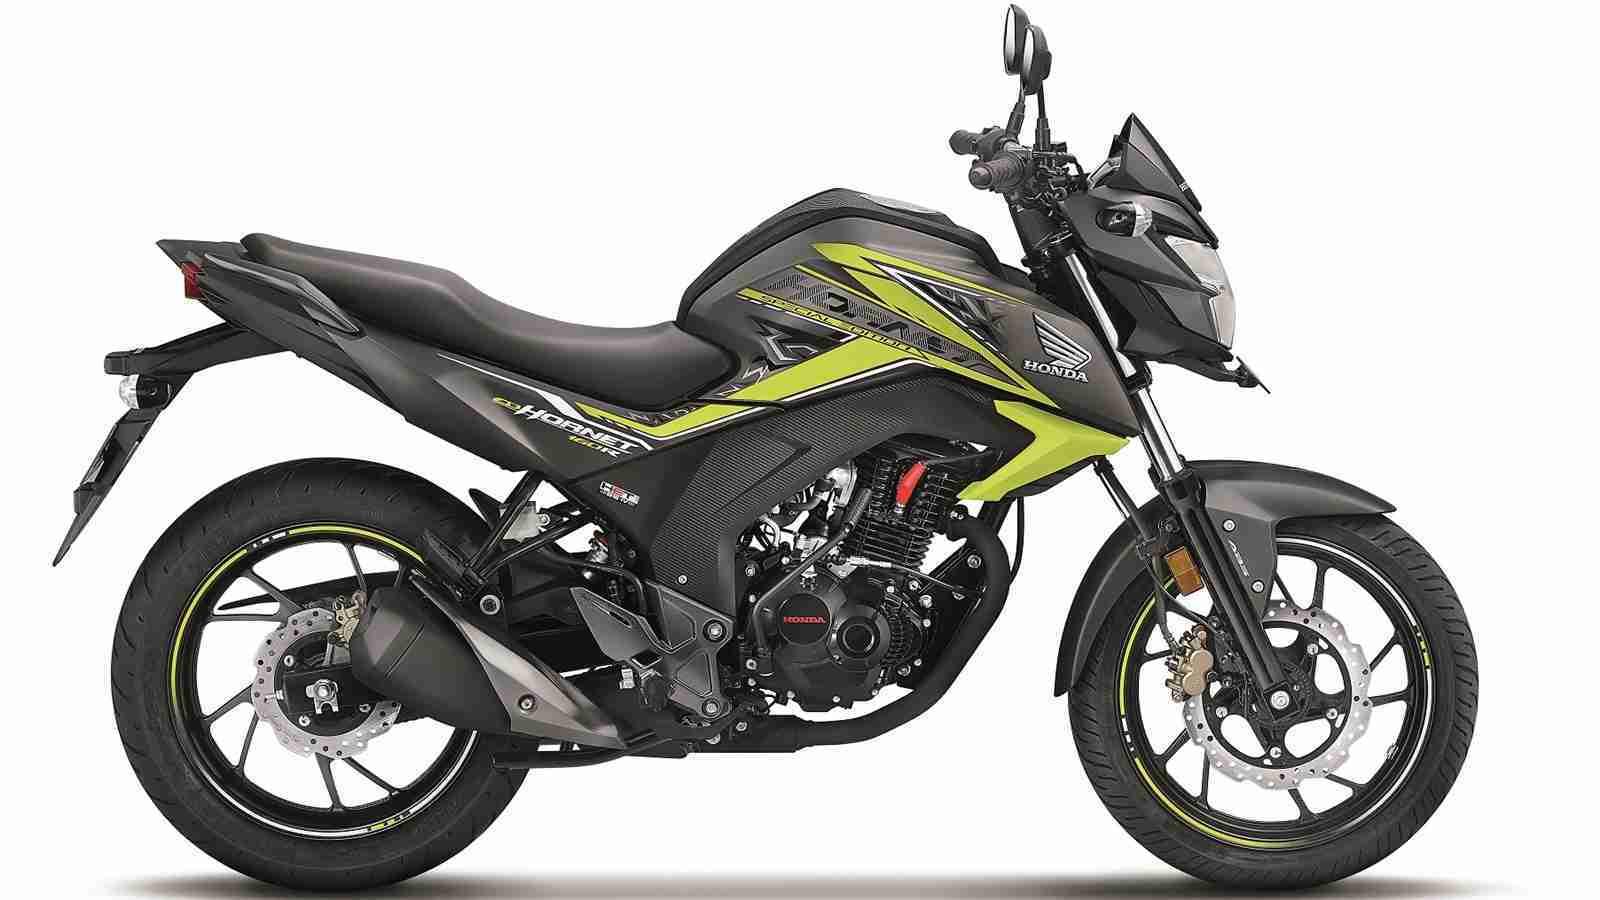 2018 Honda CB Hornet 160R right switch gear